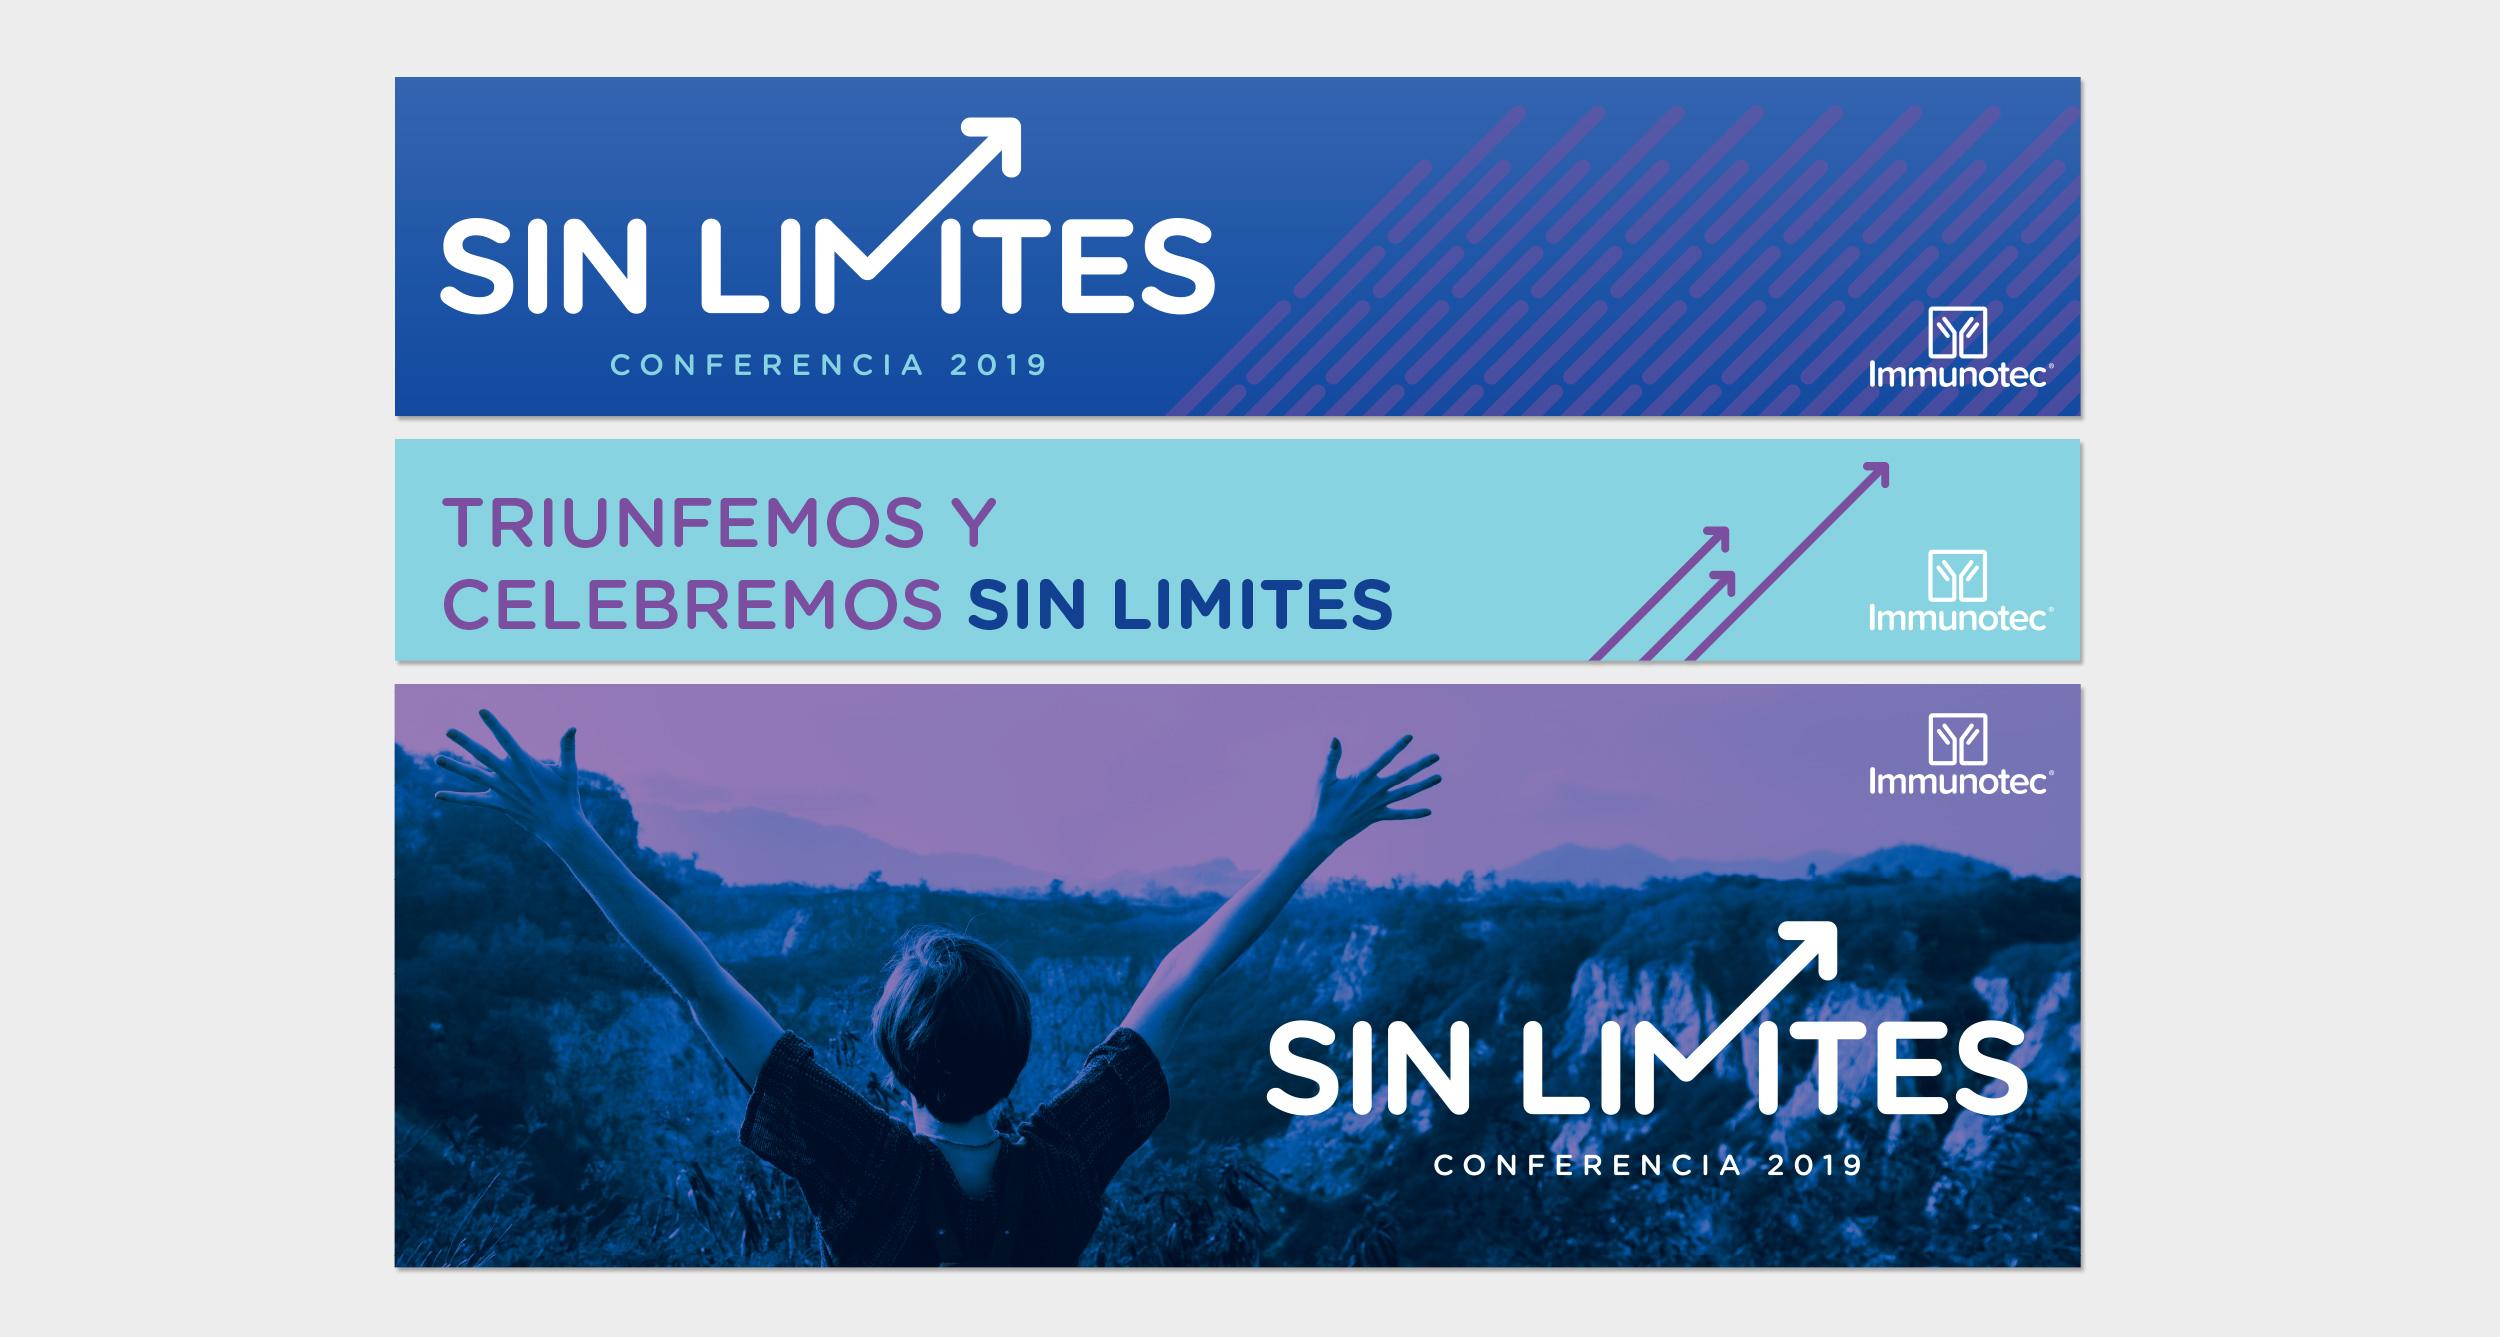 sinlimites_03.jpg